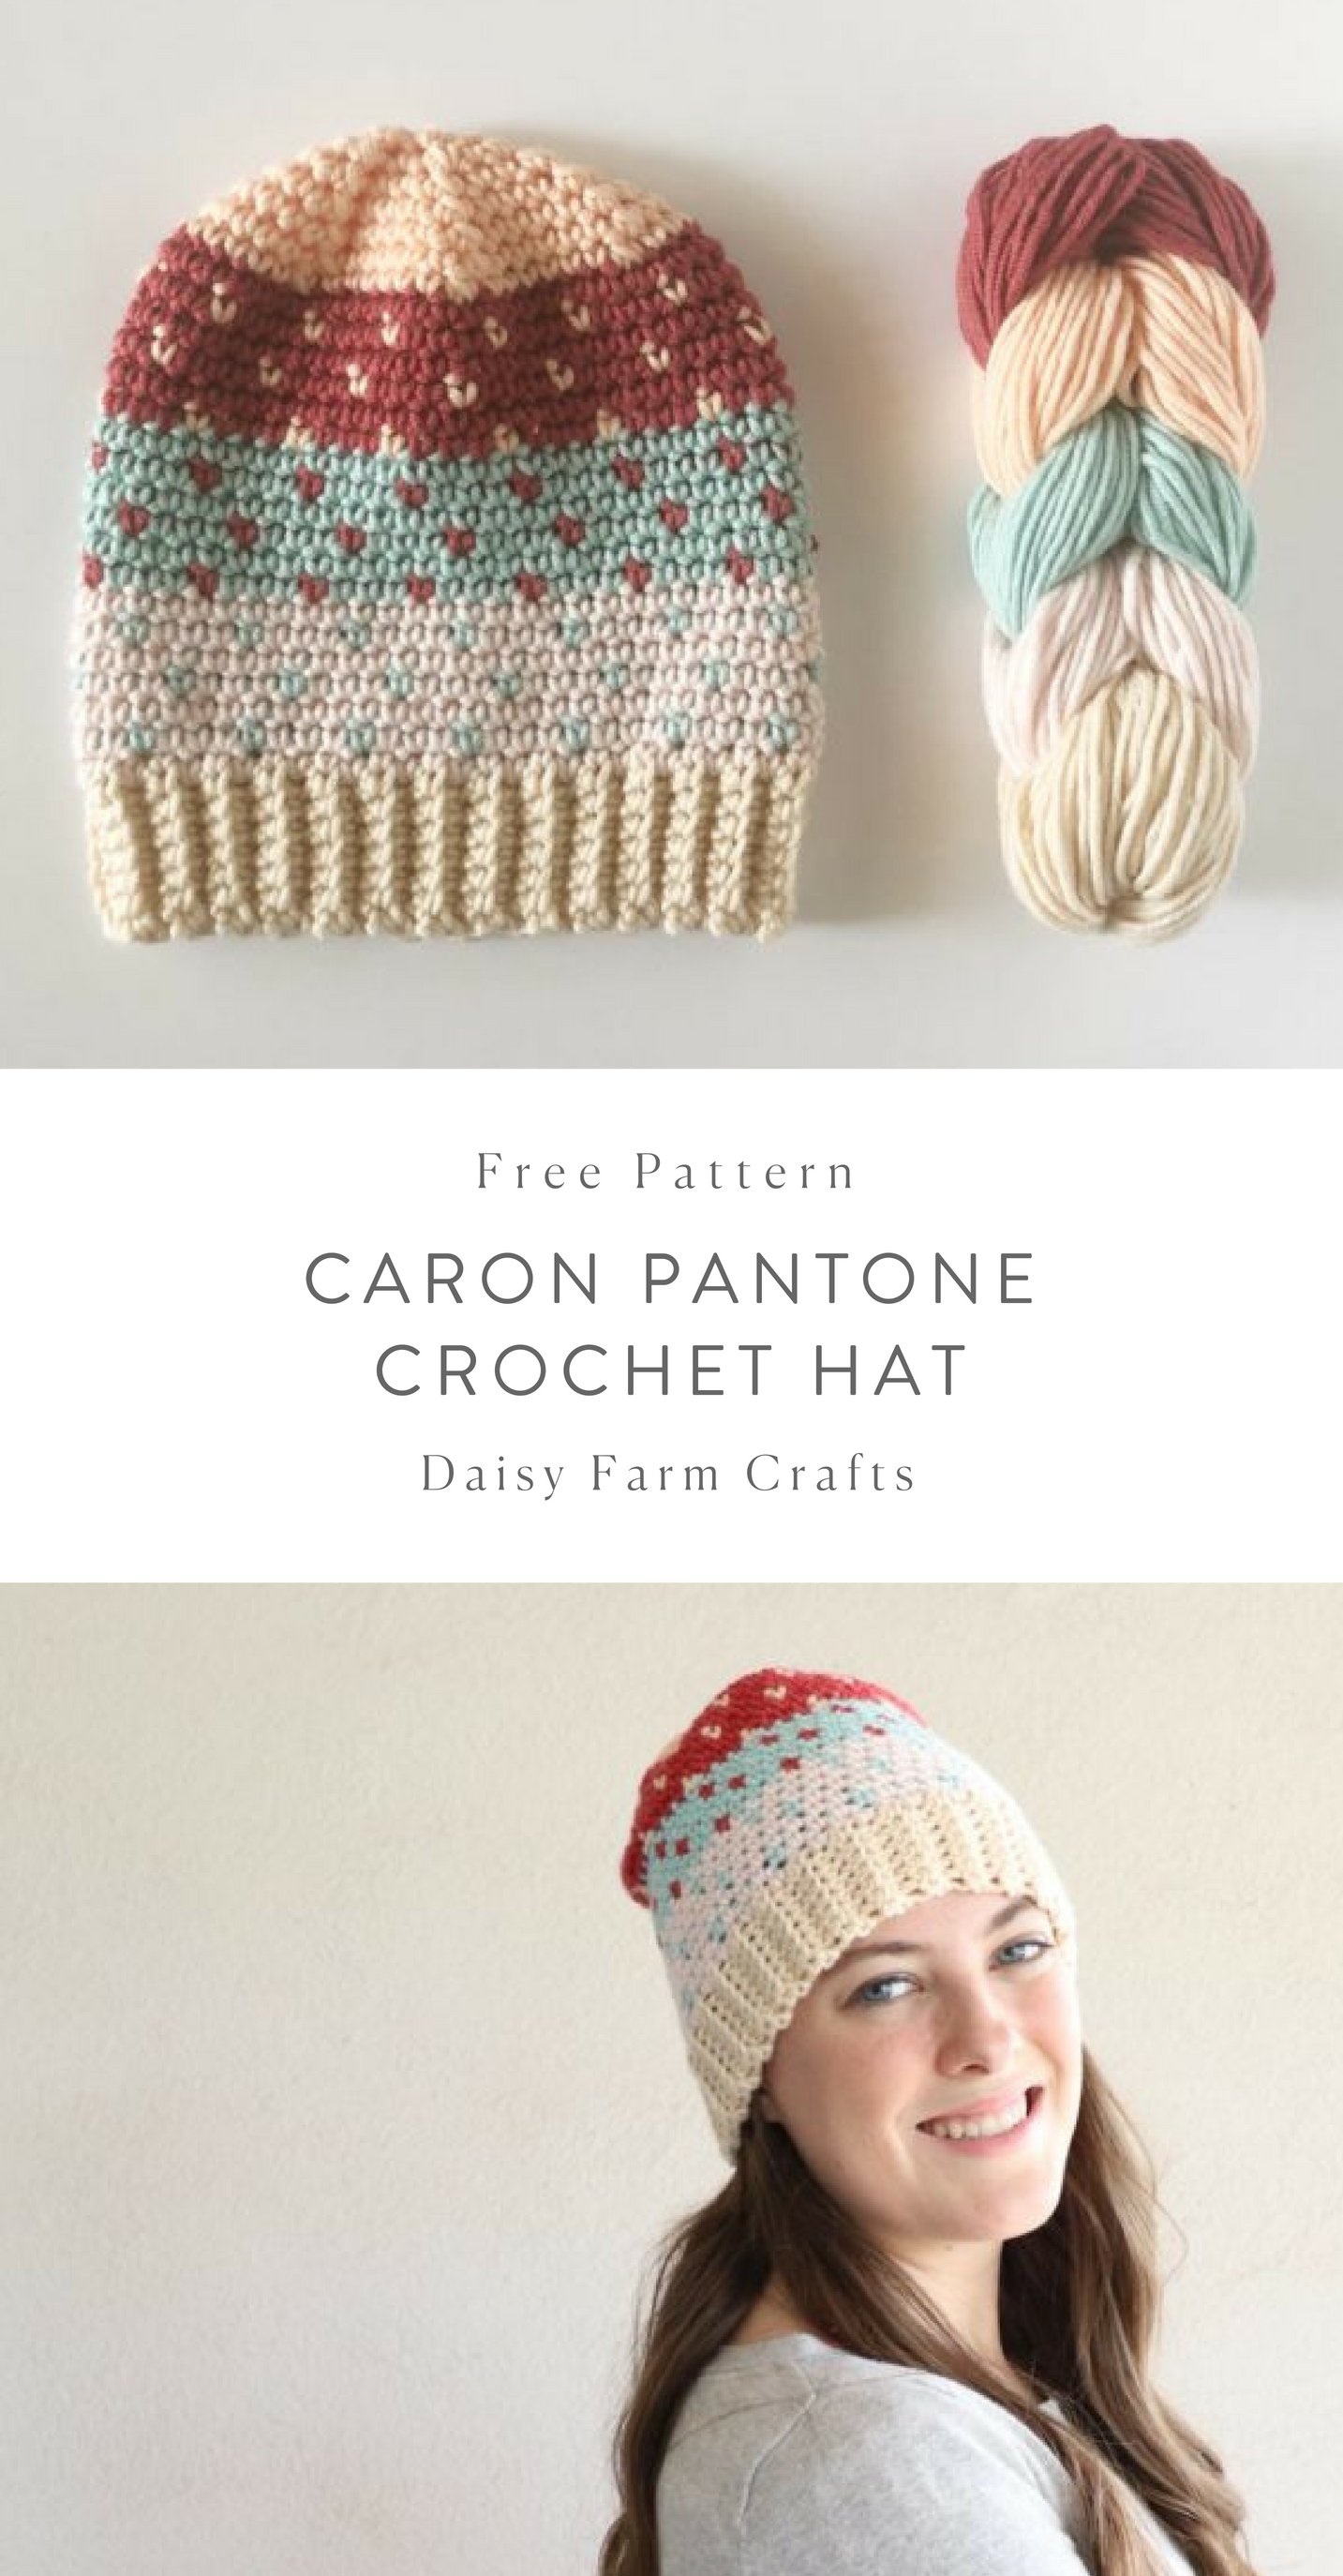 Free Pattern - Caron Pantone Crochet Hat #crochet | All \'bout ...